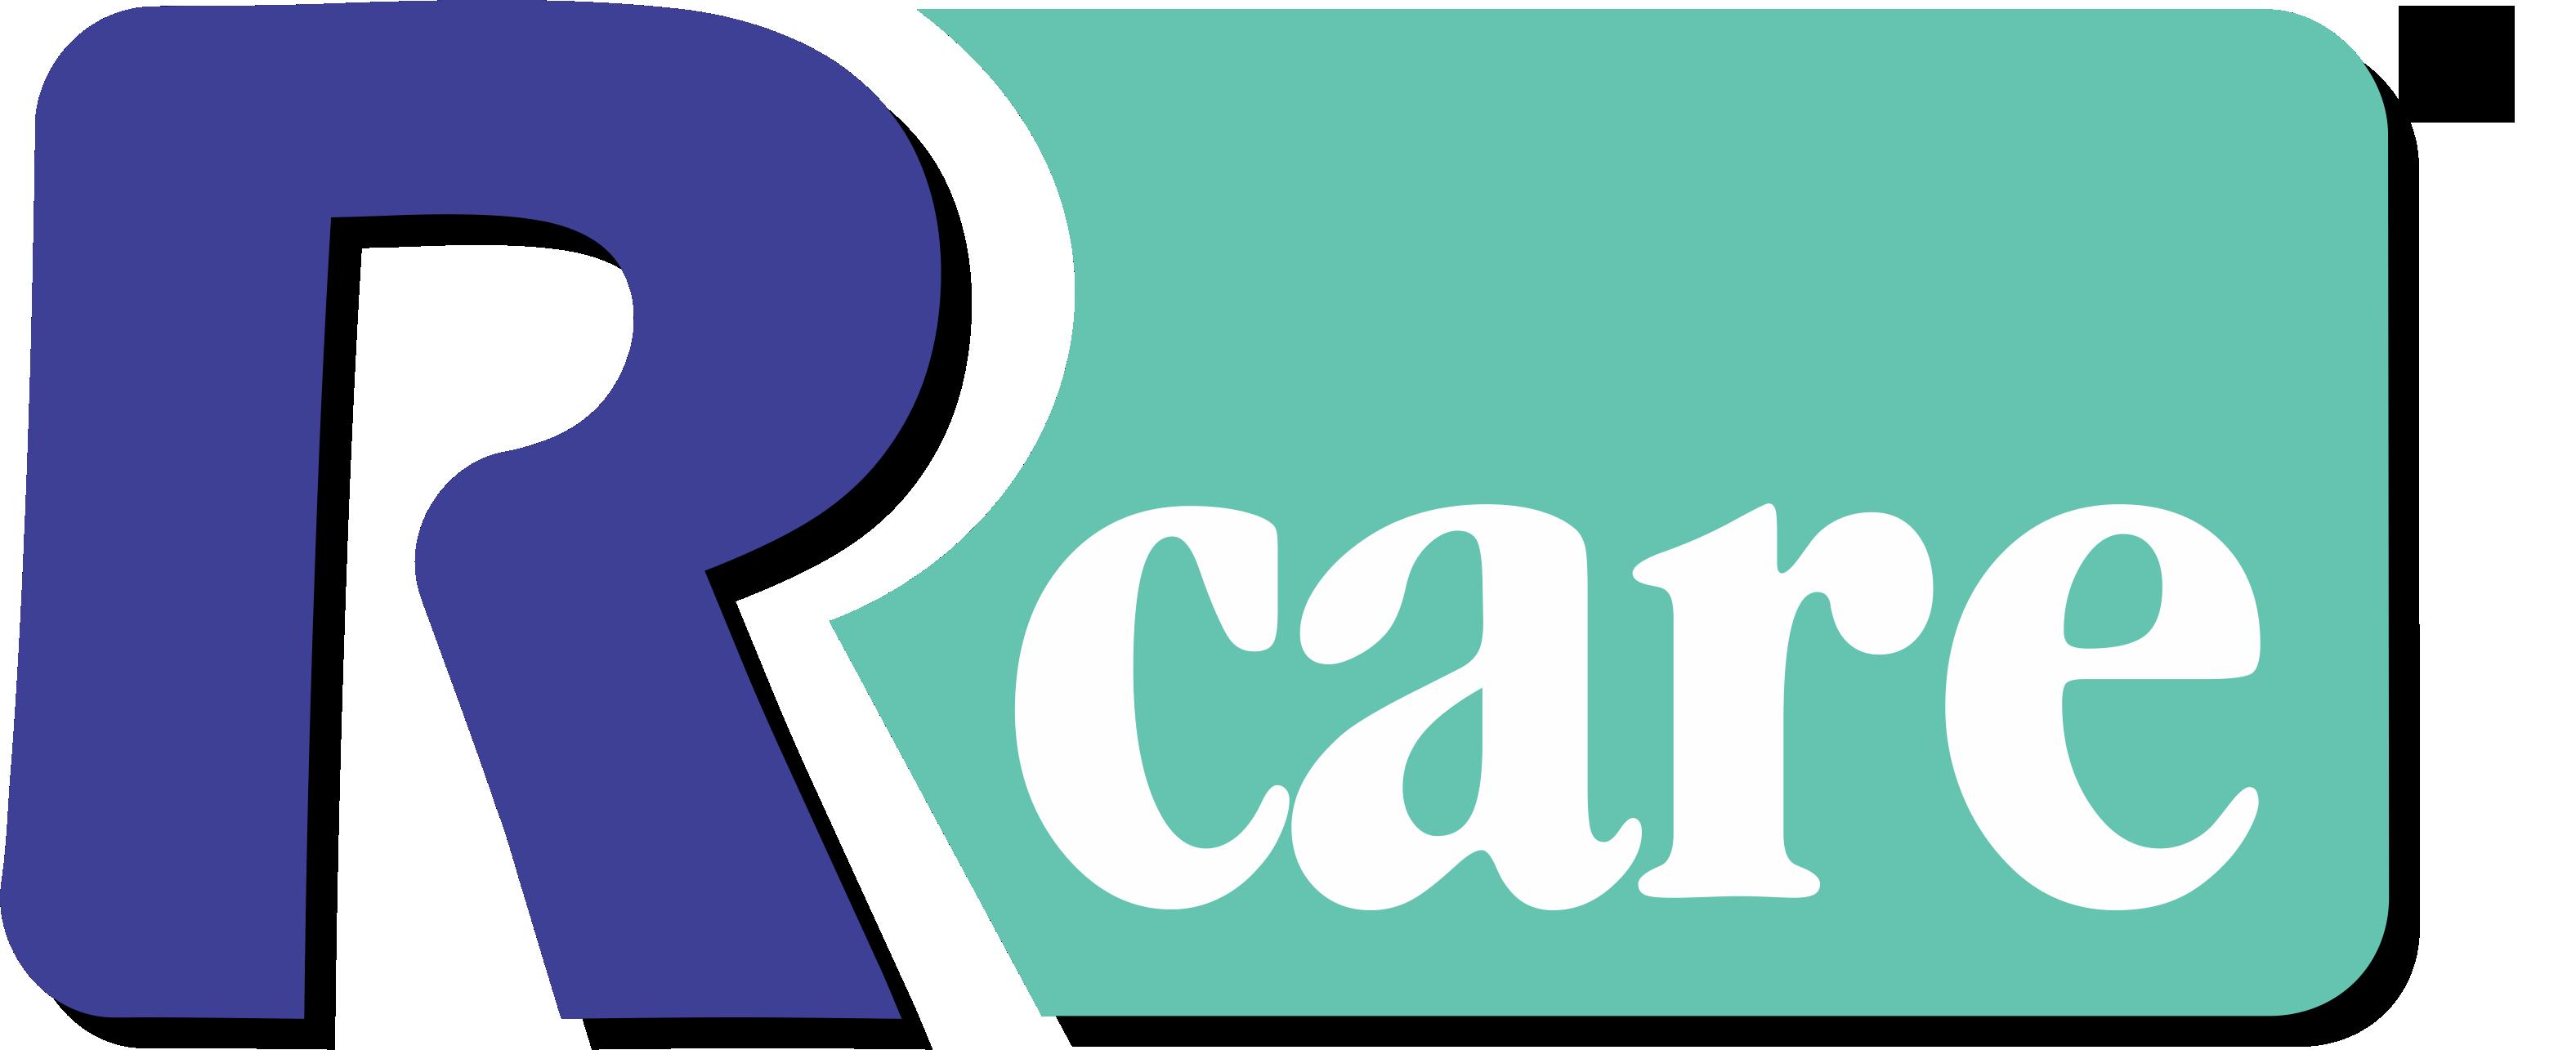 News - Response Care, Inc